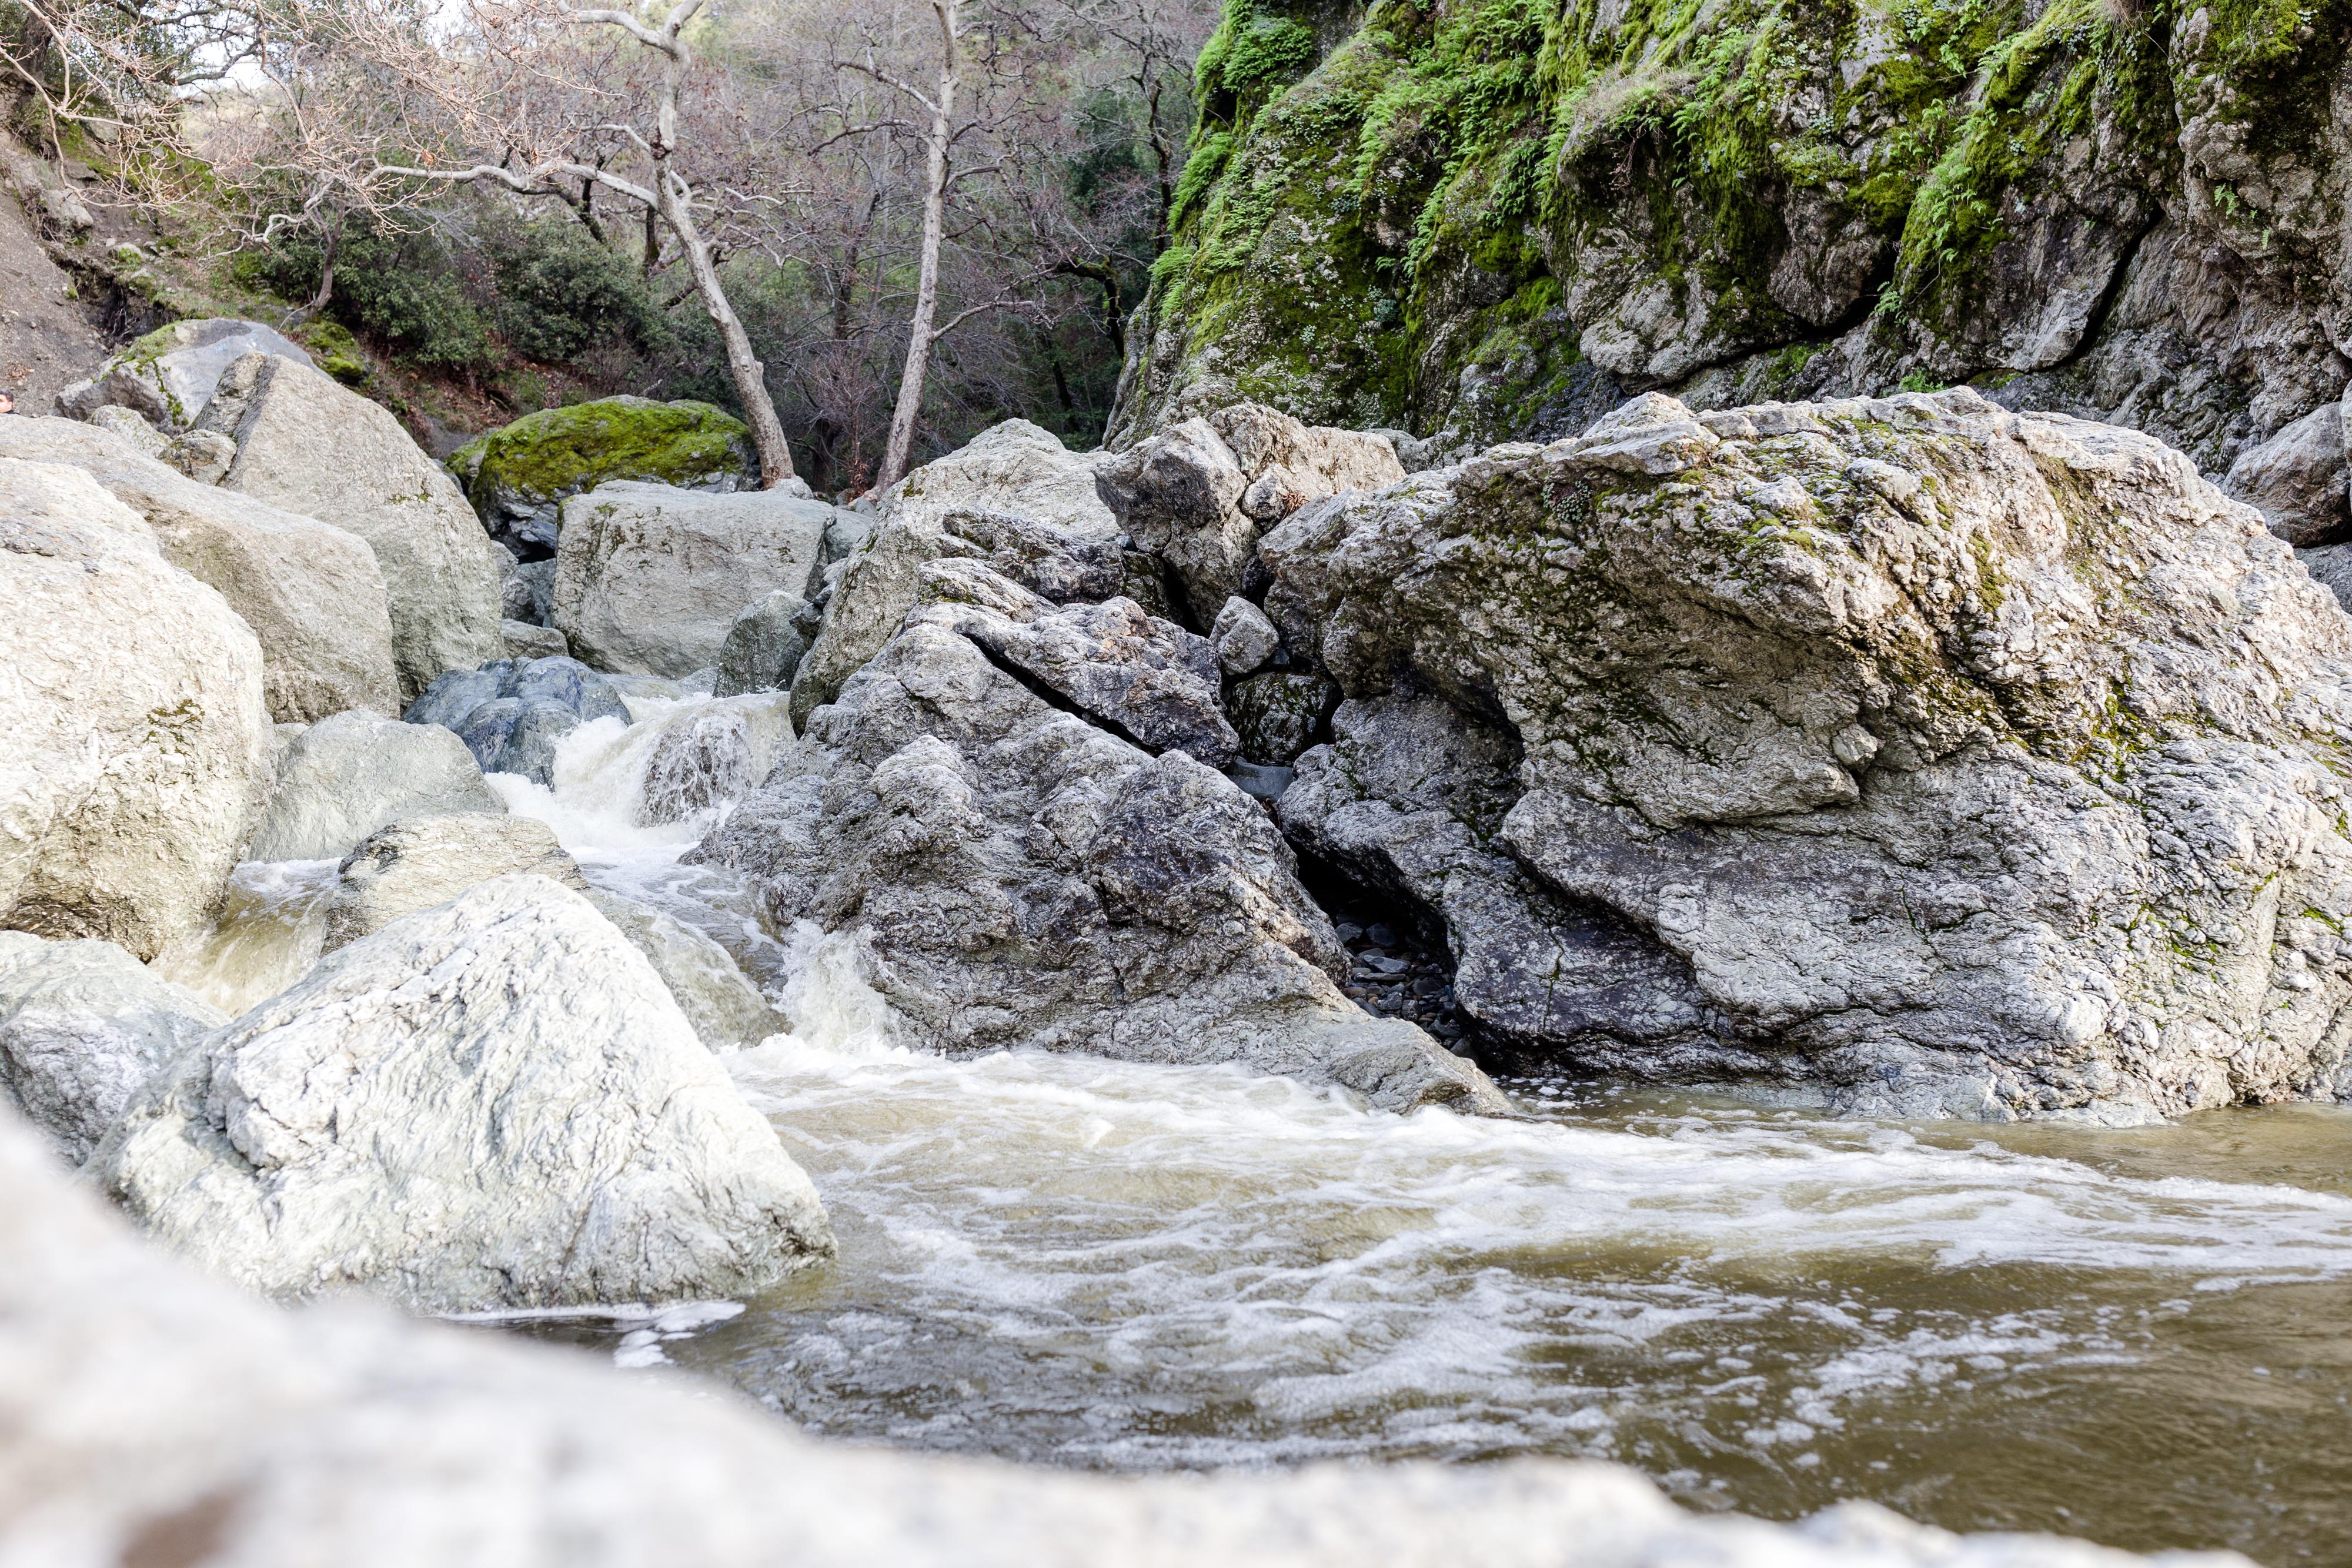 Waterfalls at Little Yosemite in Sunol, CA